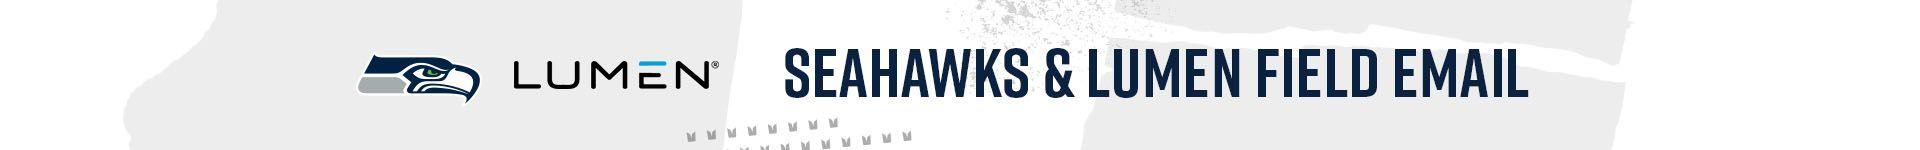 201119-seahawks-lumen-field-email-header-1920x150